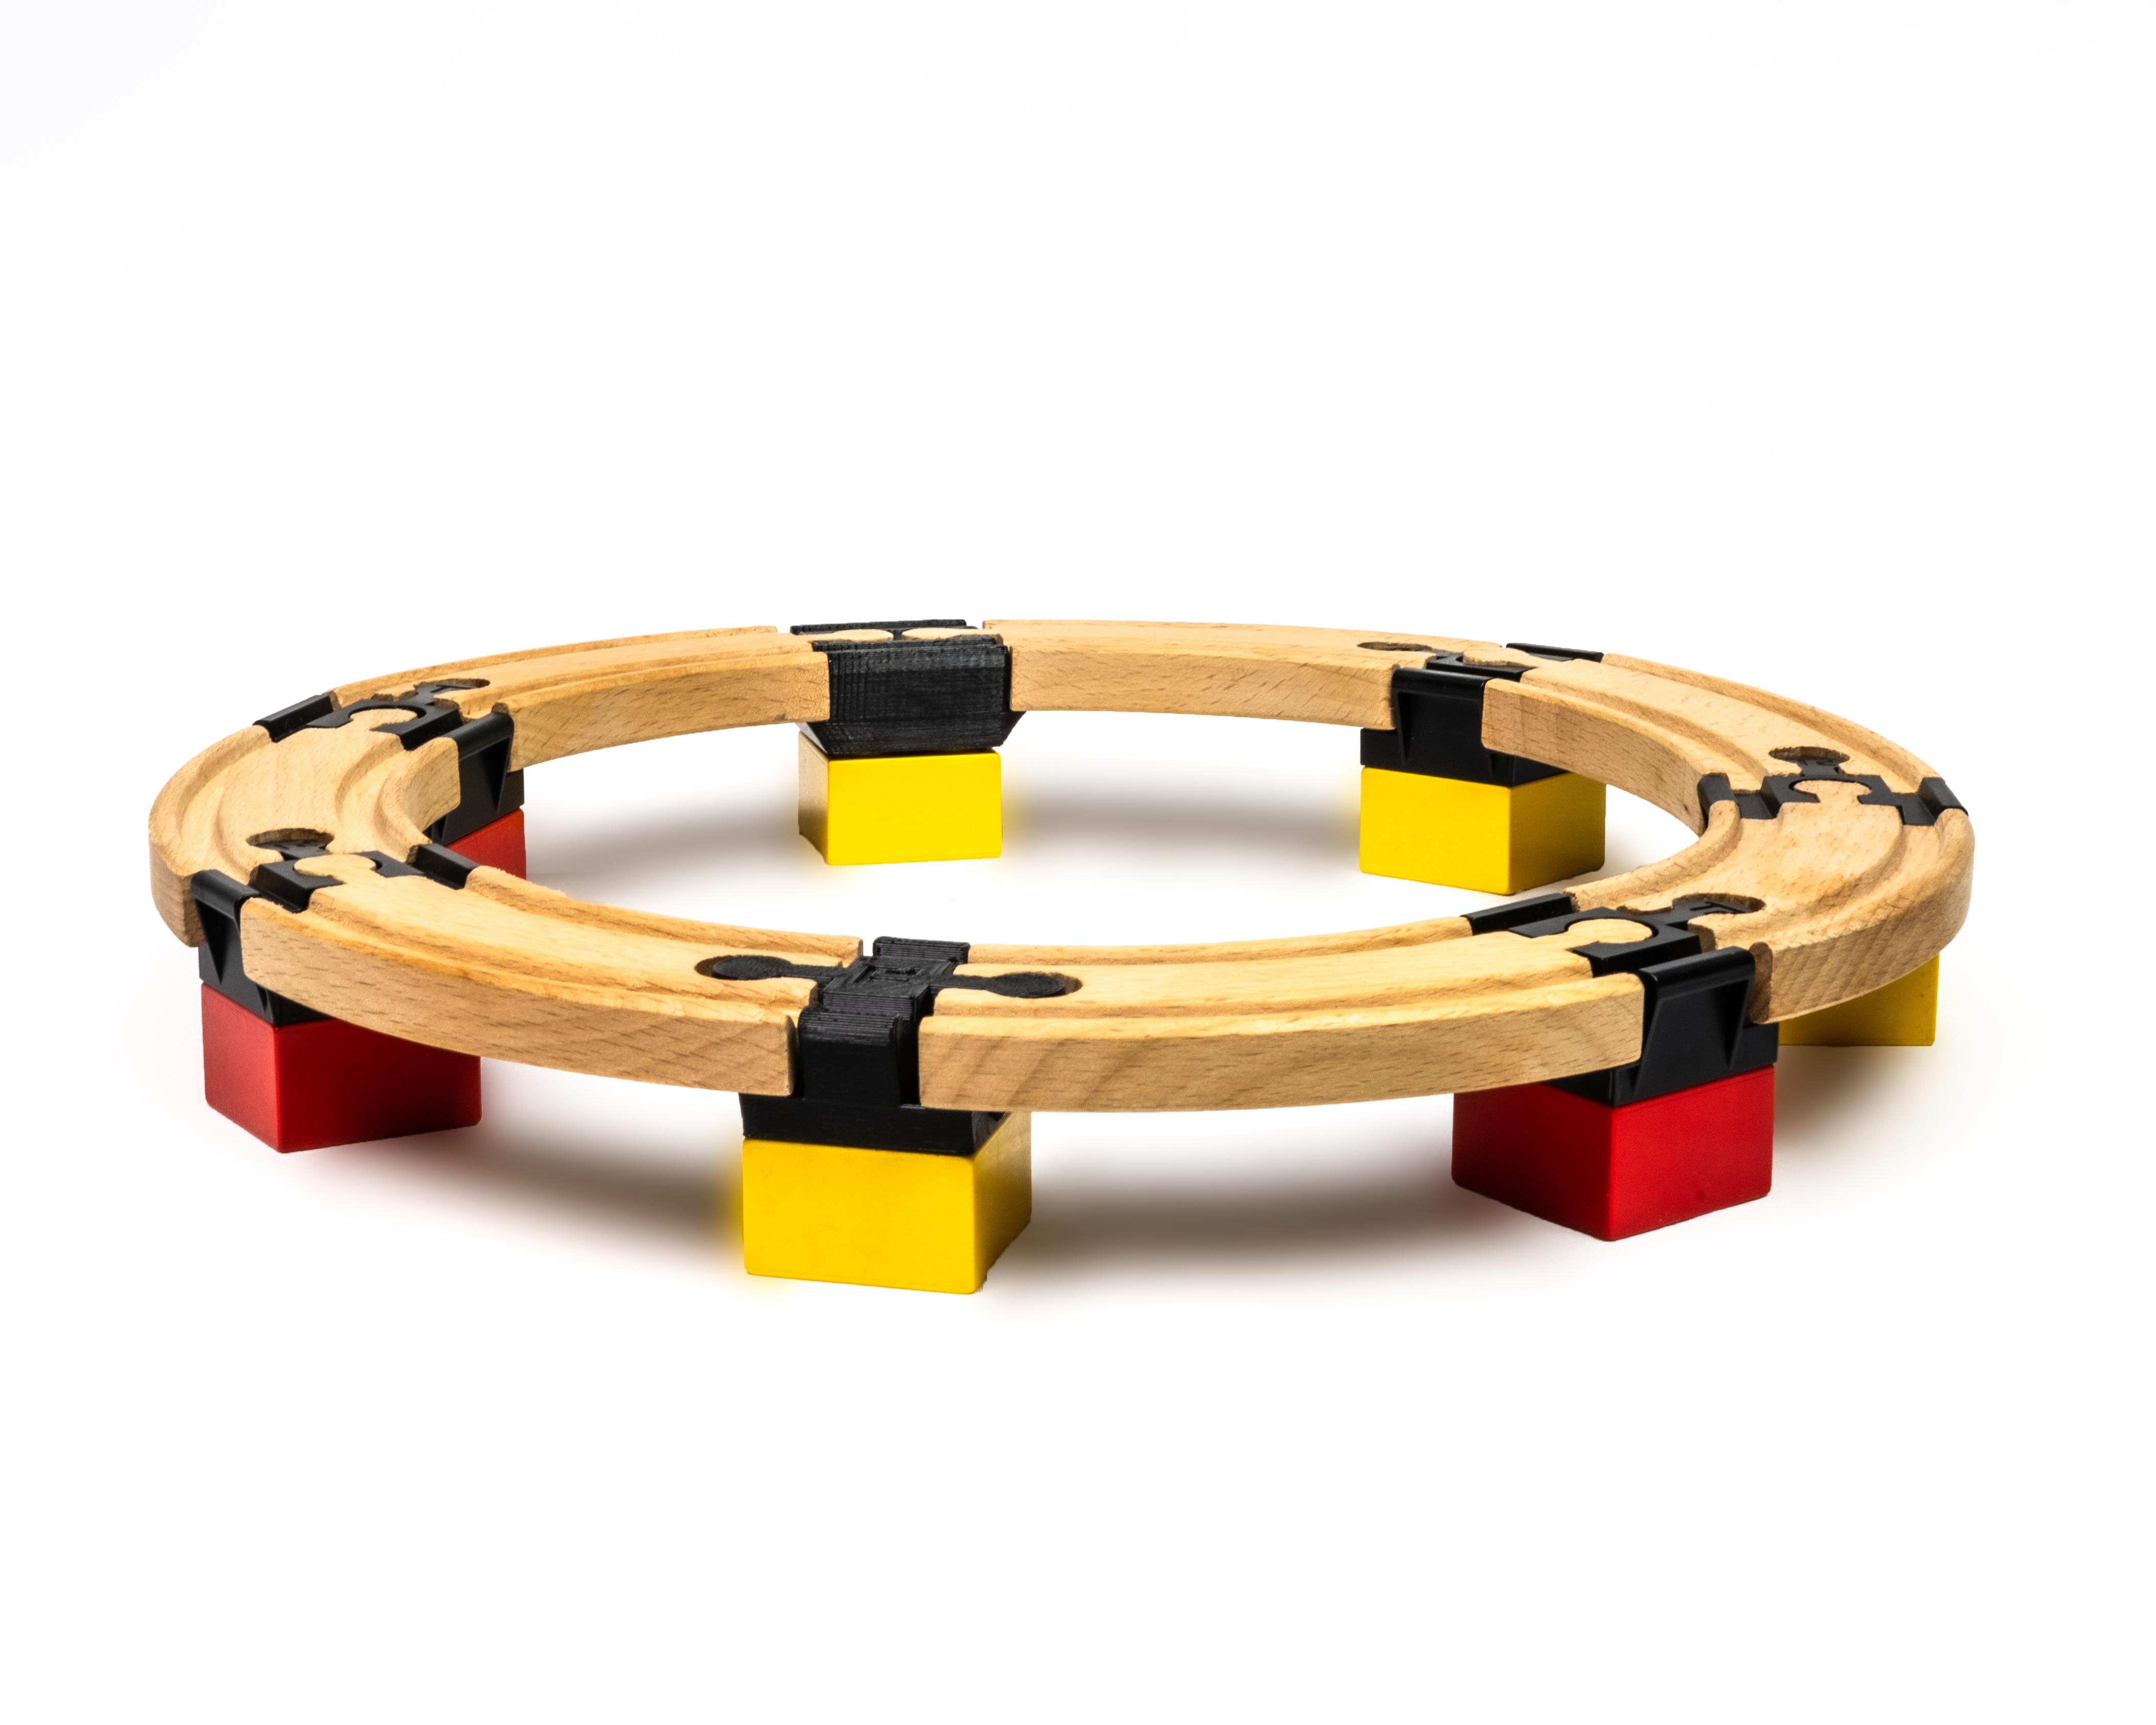 TOY2 Toy2 - Tågebanedelar - Basic Pack - Small